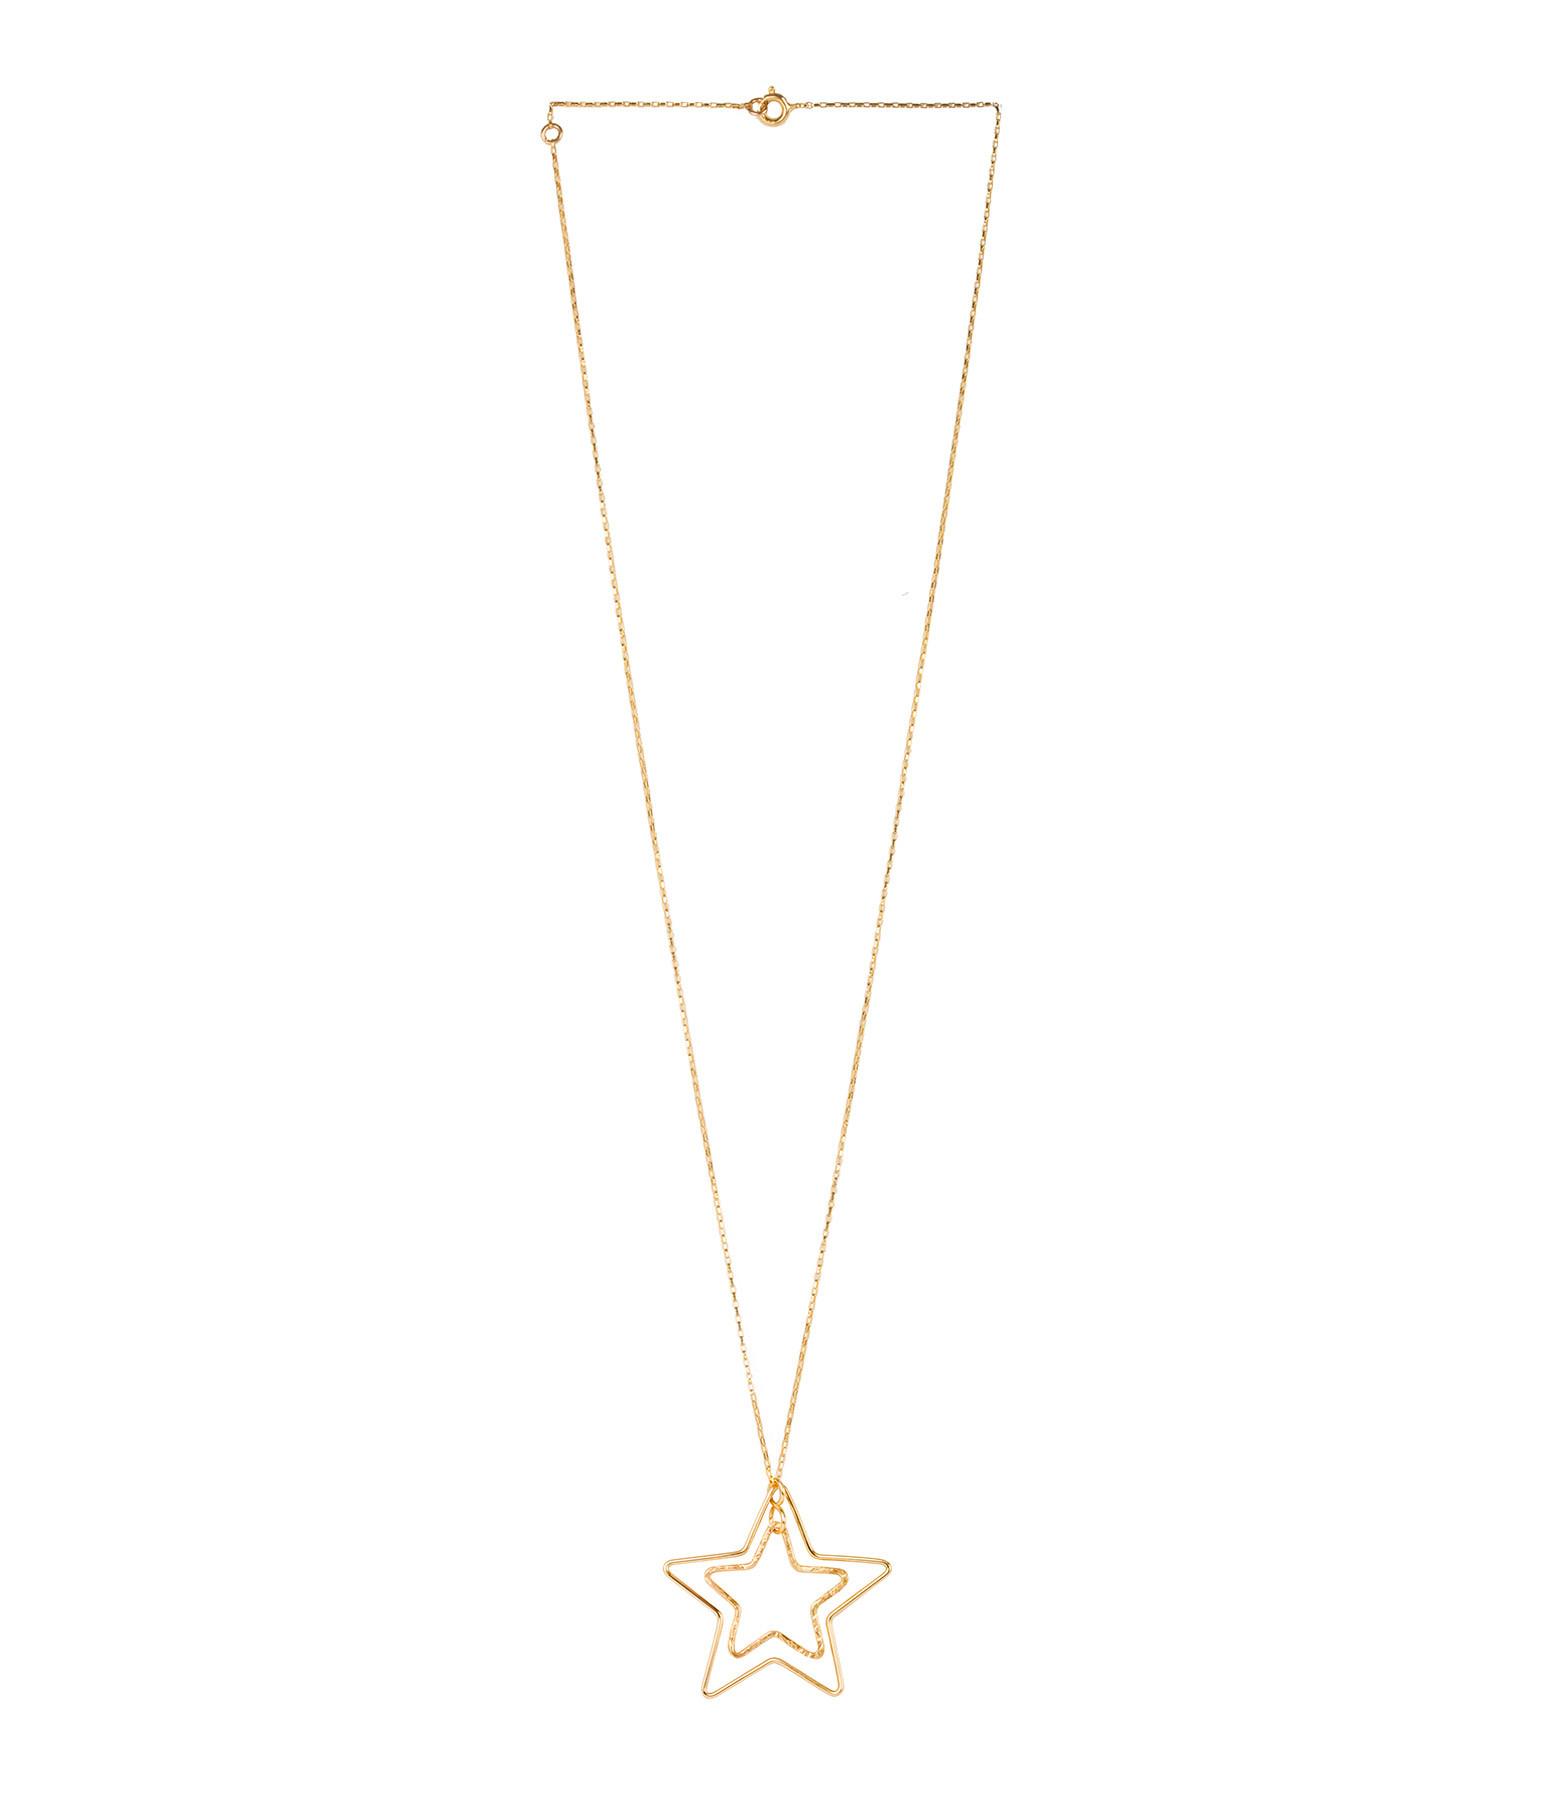 ATELIER PAULIN - Collier Stardust Stellar Gold Filled 14K